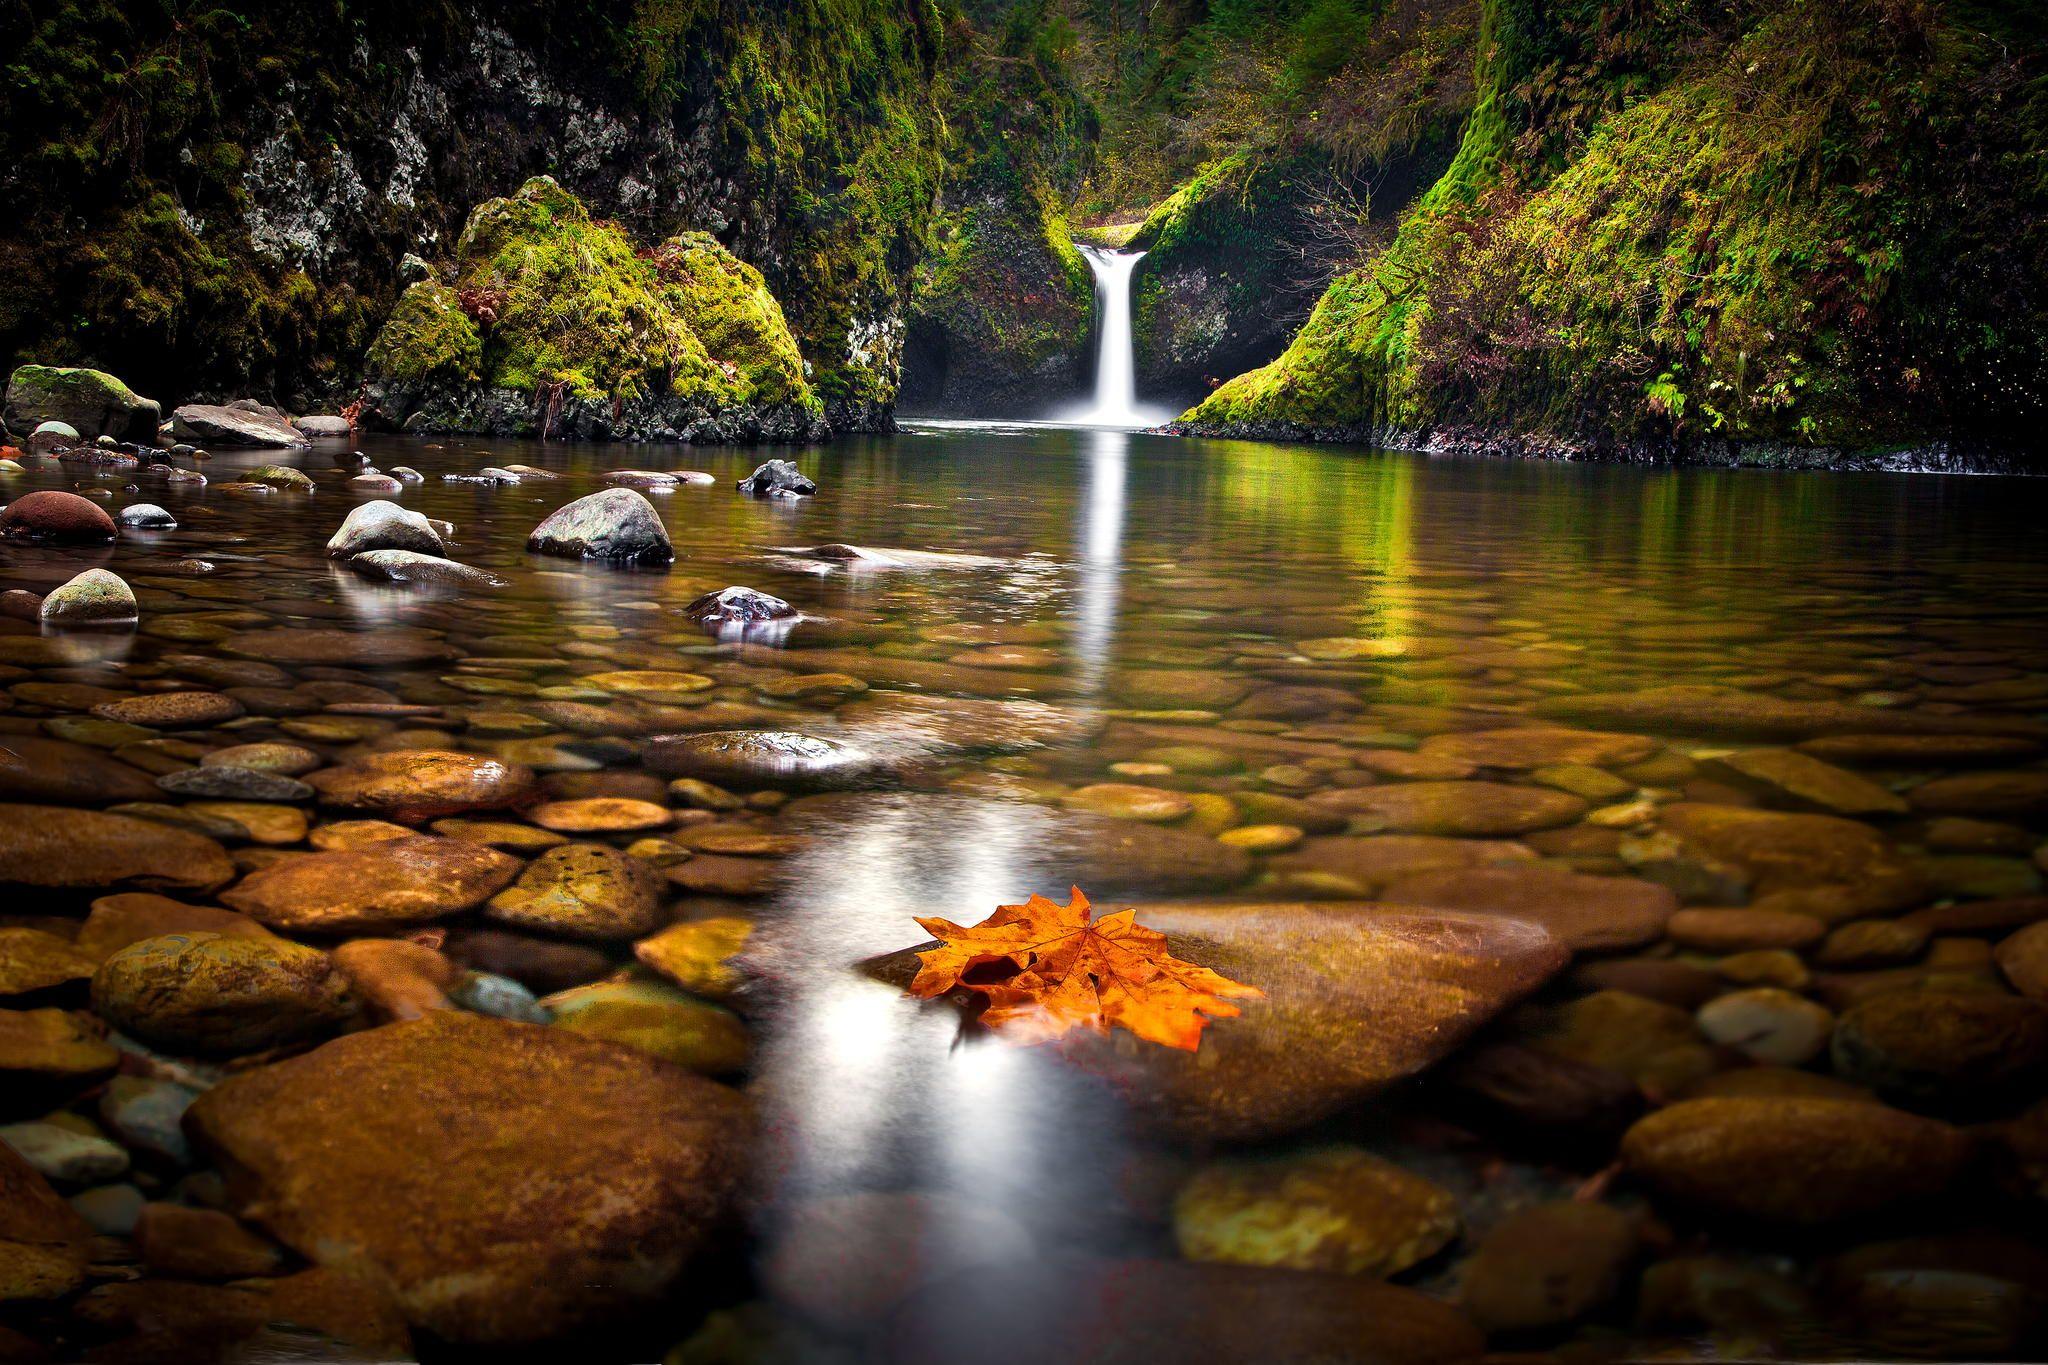 Punch Bowl Waterfalls Waterfall Wallpaper Autumn Waterfalls Waterfall Wallpaper Hd